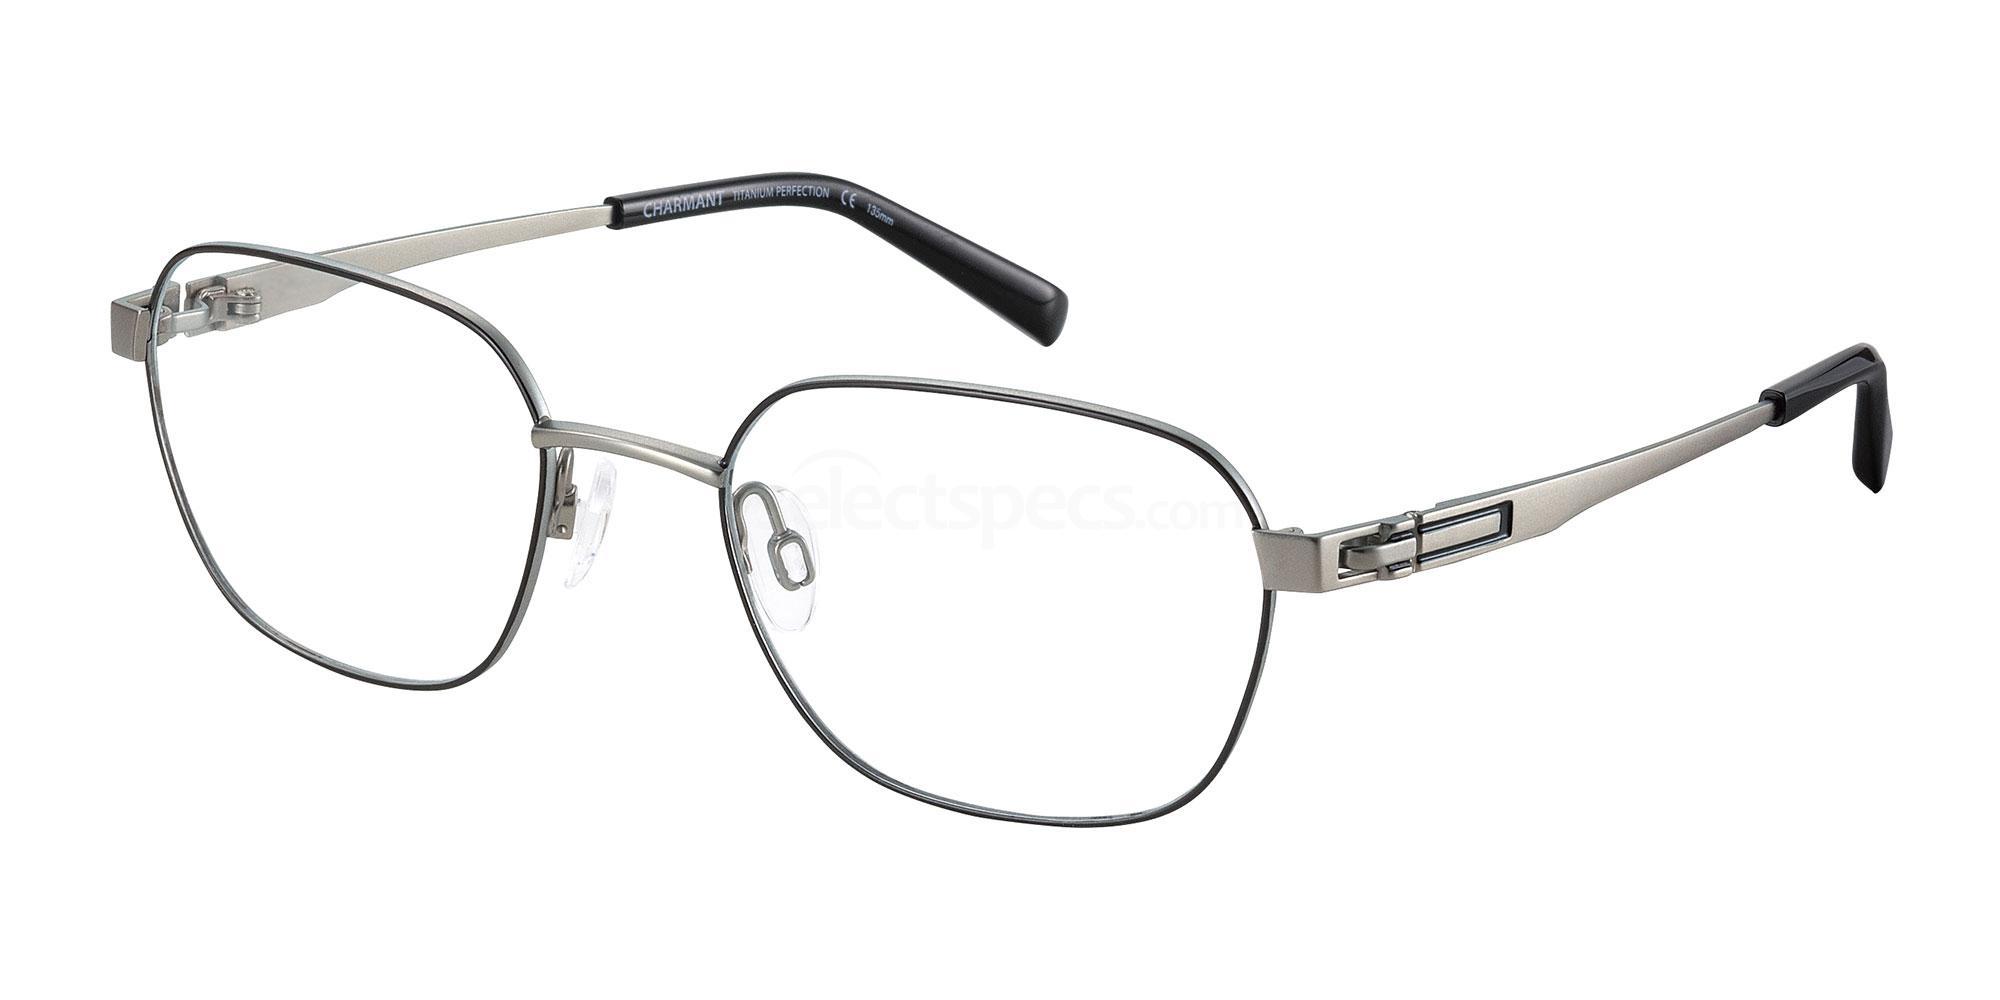 BK CH29713 Glasses, Charmant Titanium Perfection